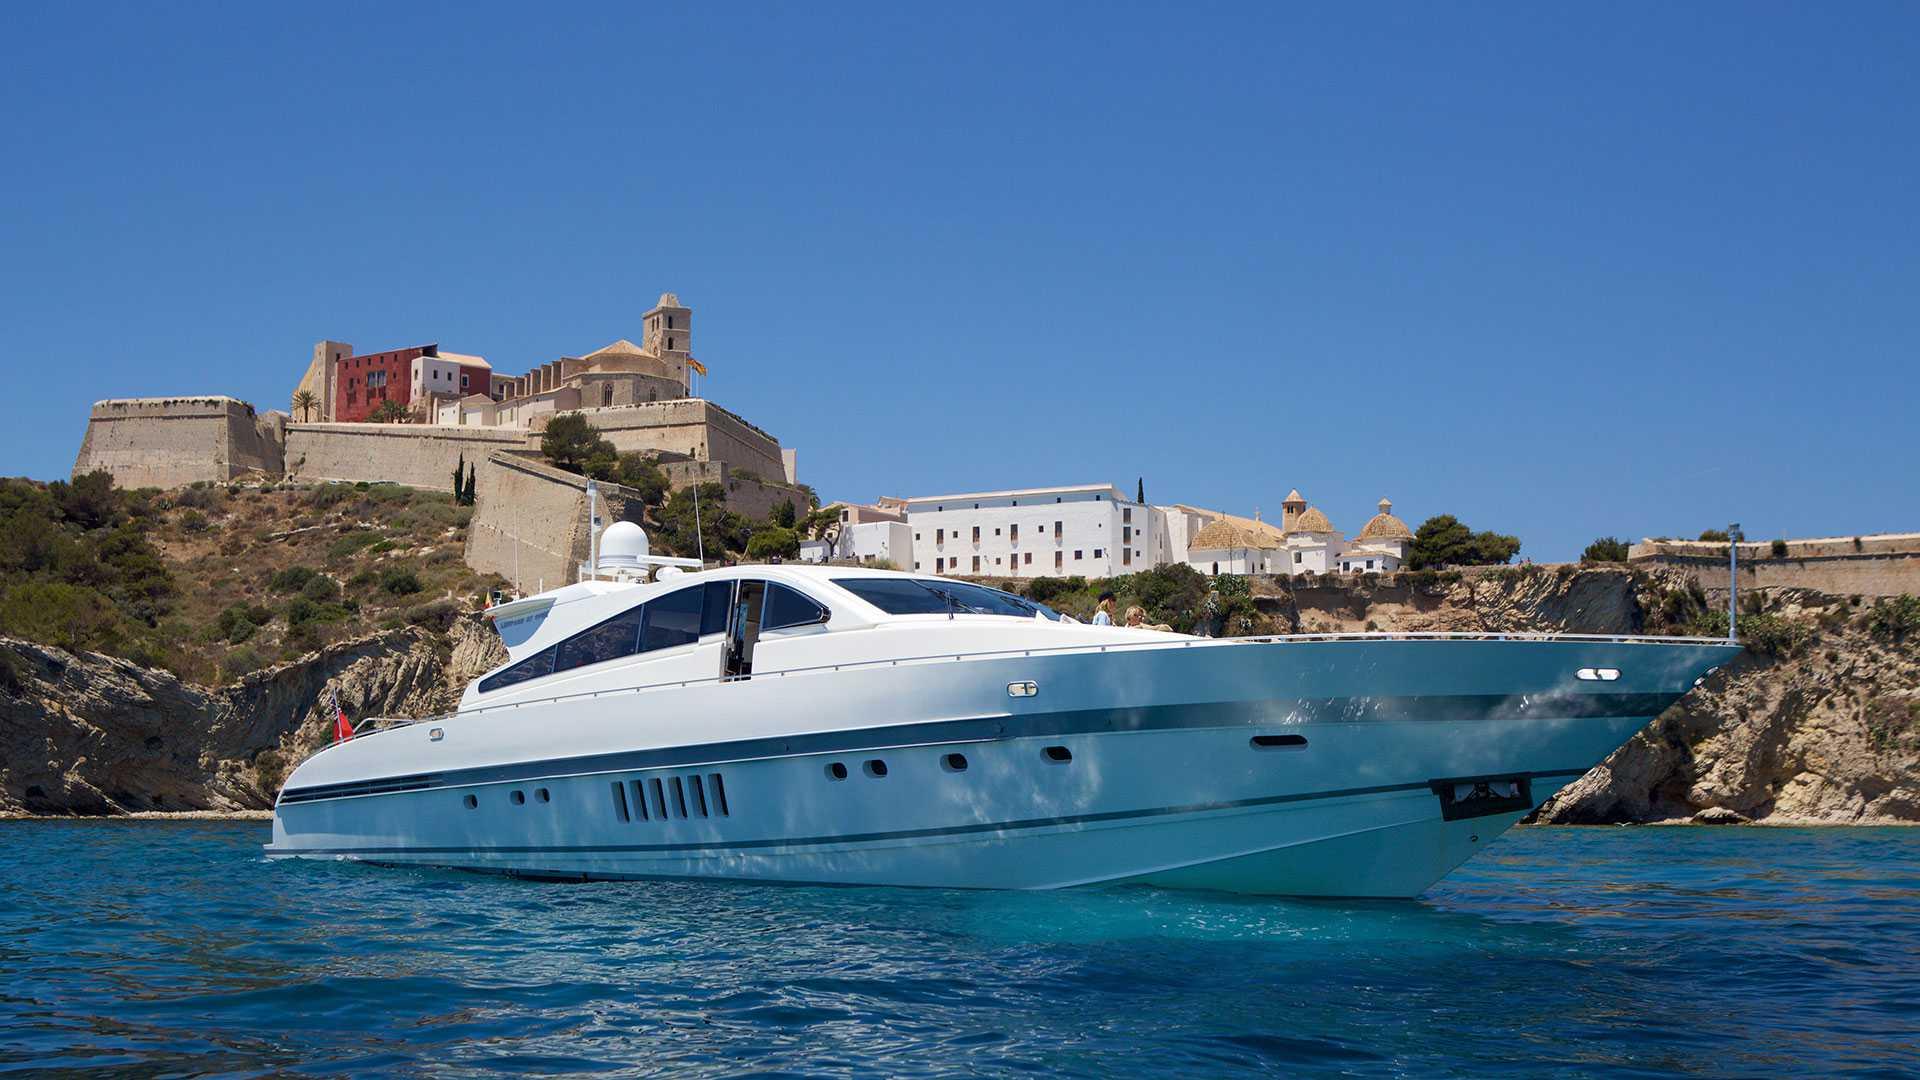 Arno Leopard Yacht Ibiza Yachts 1920x1080 Download Hd Wallpaper Wallpapertip